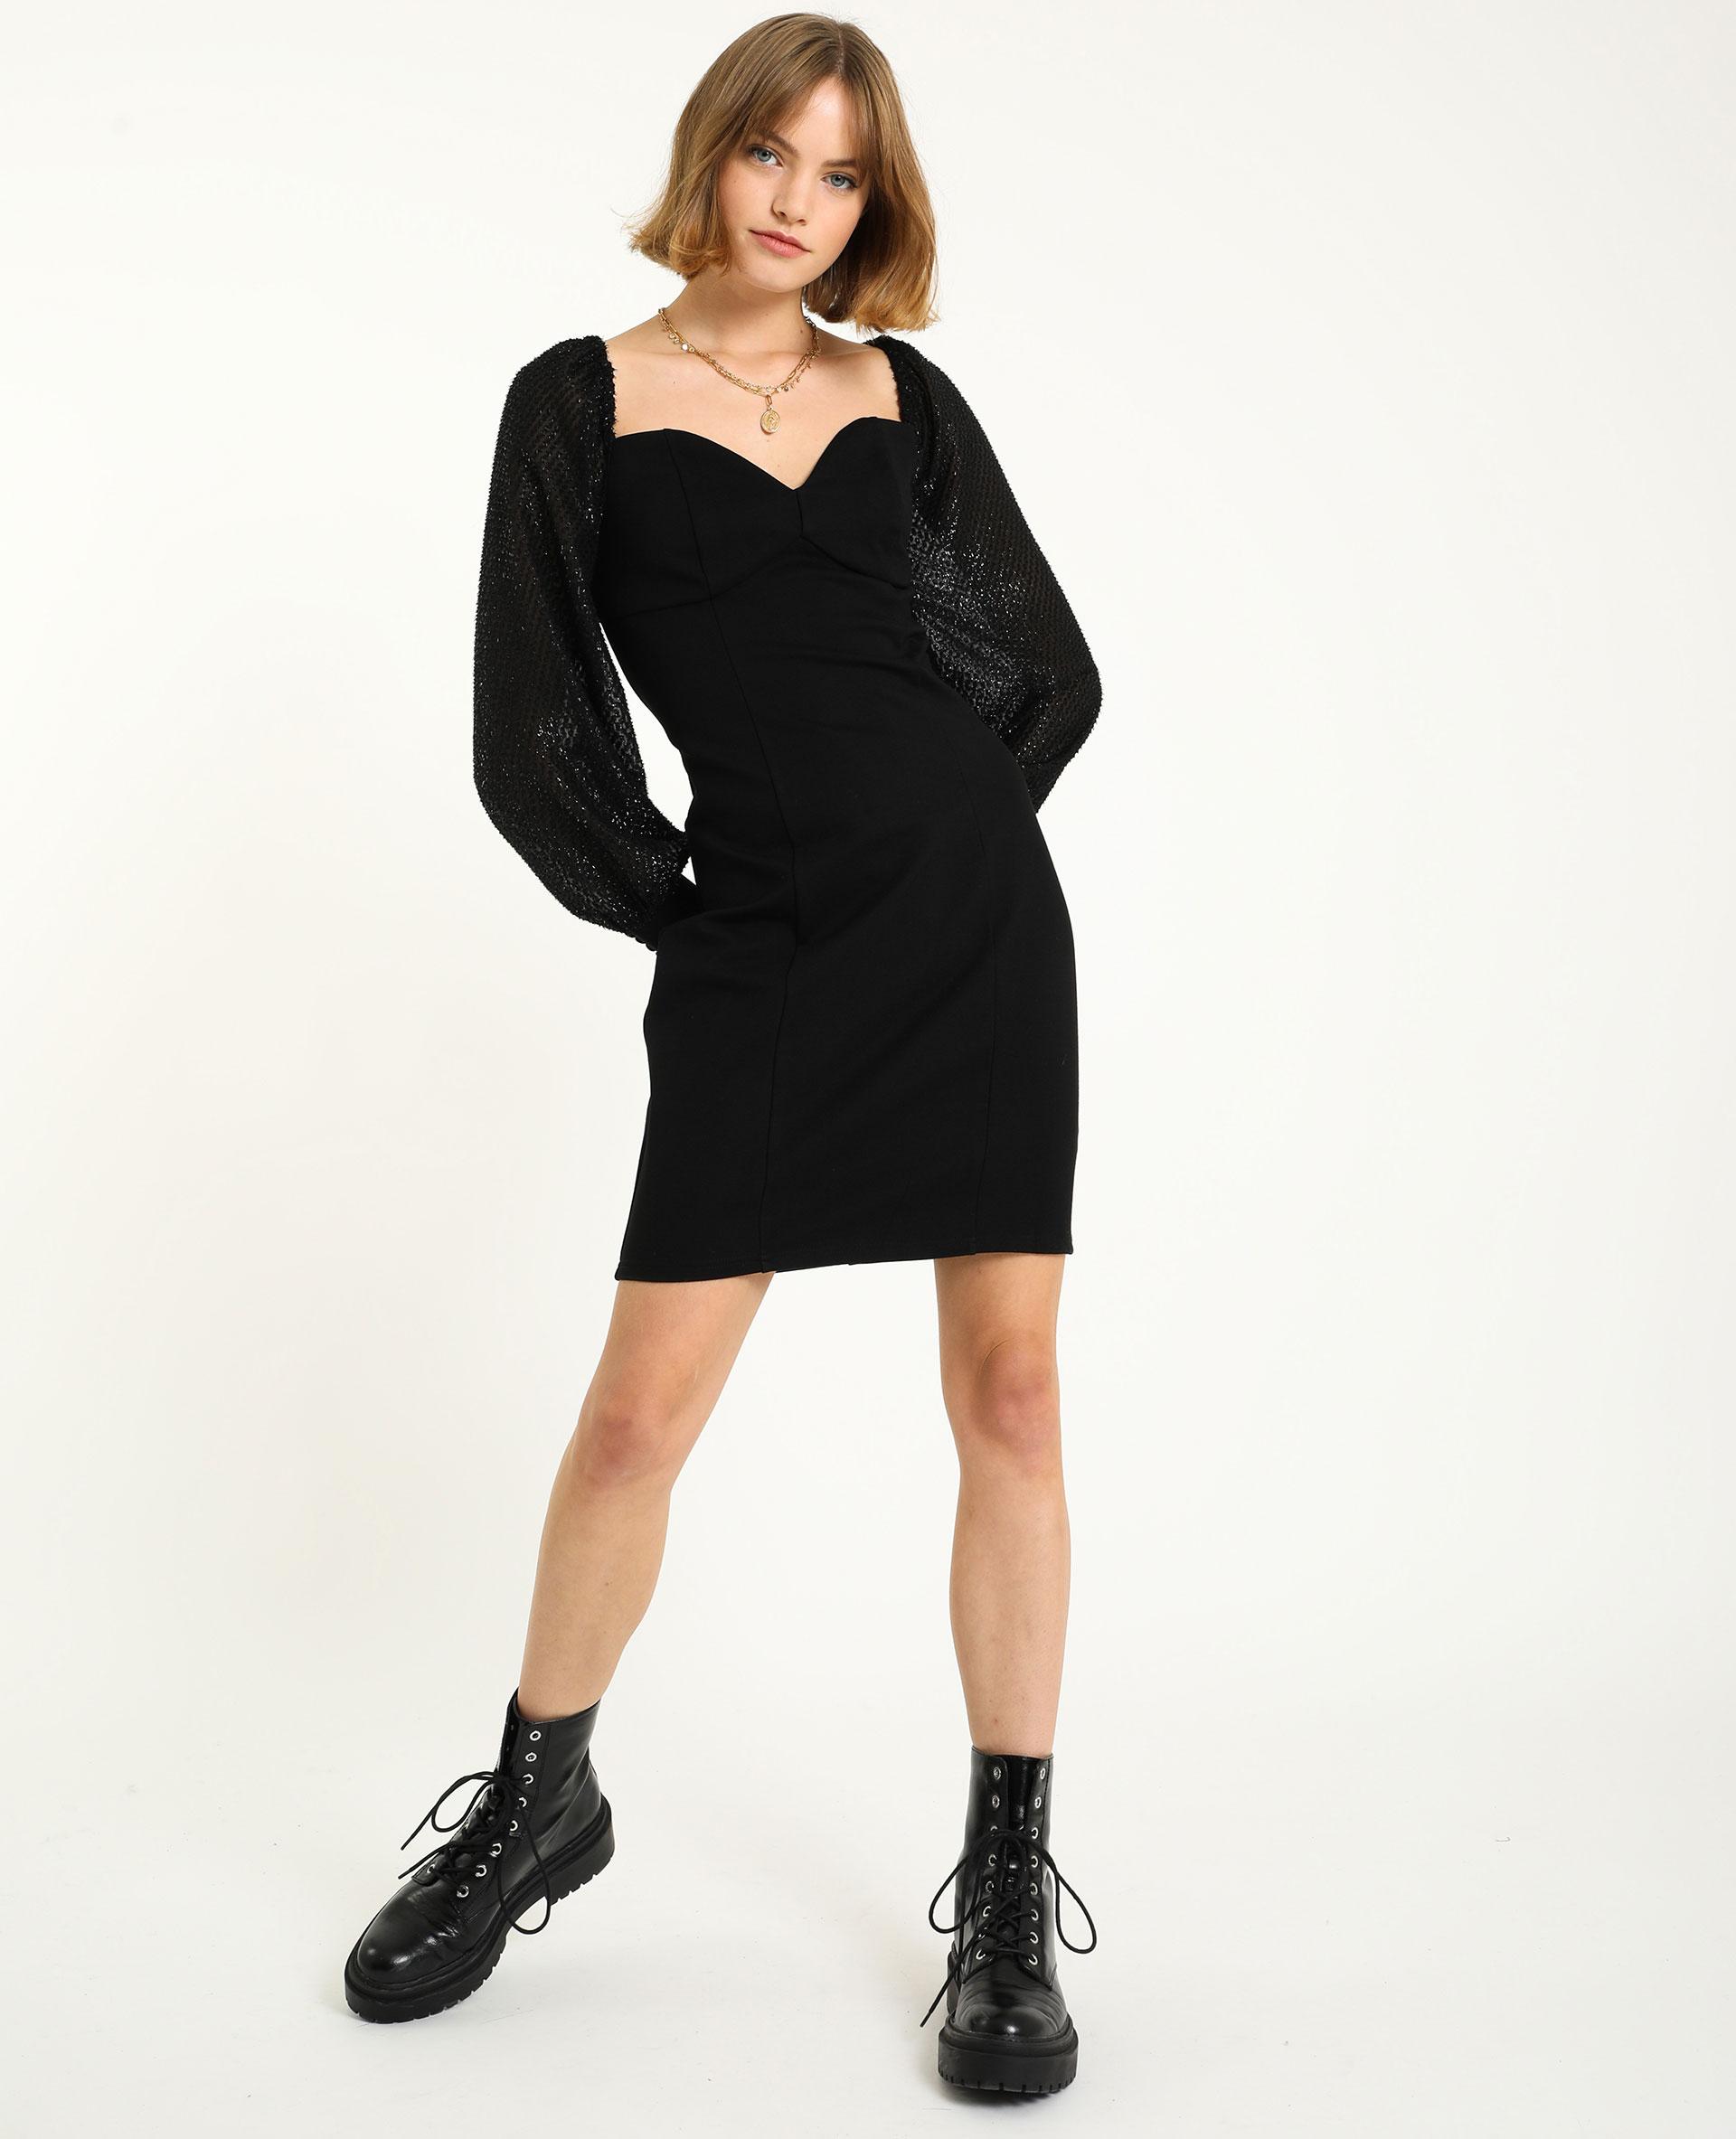 Robe courte noir - Pimkie